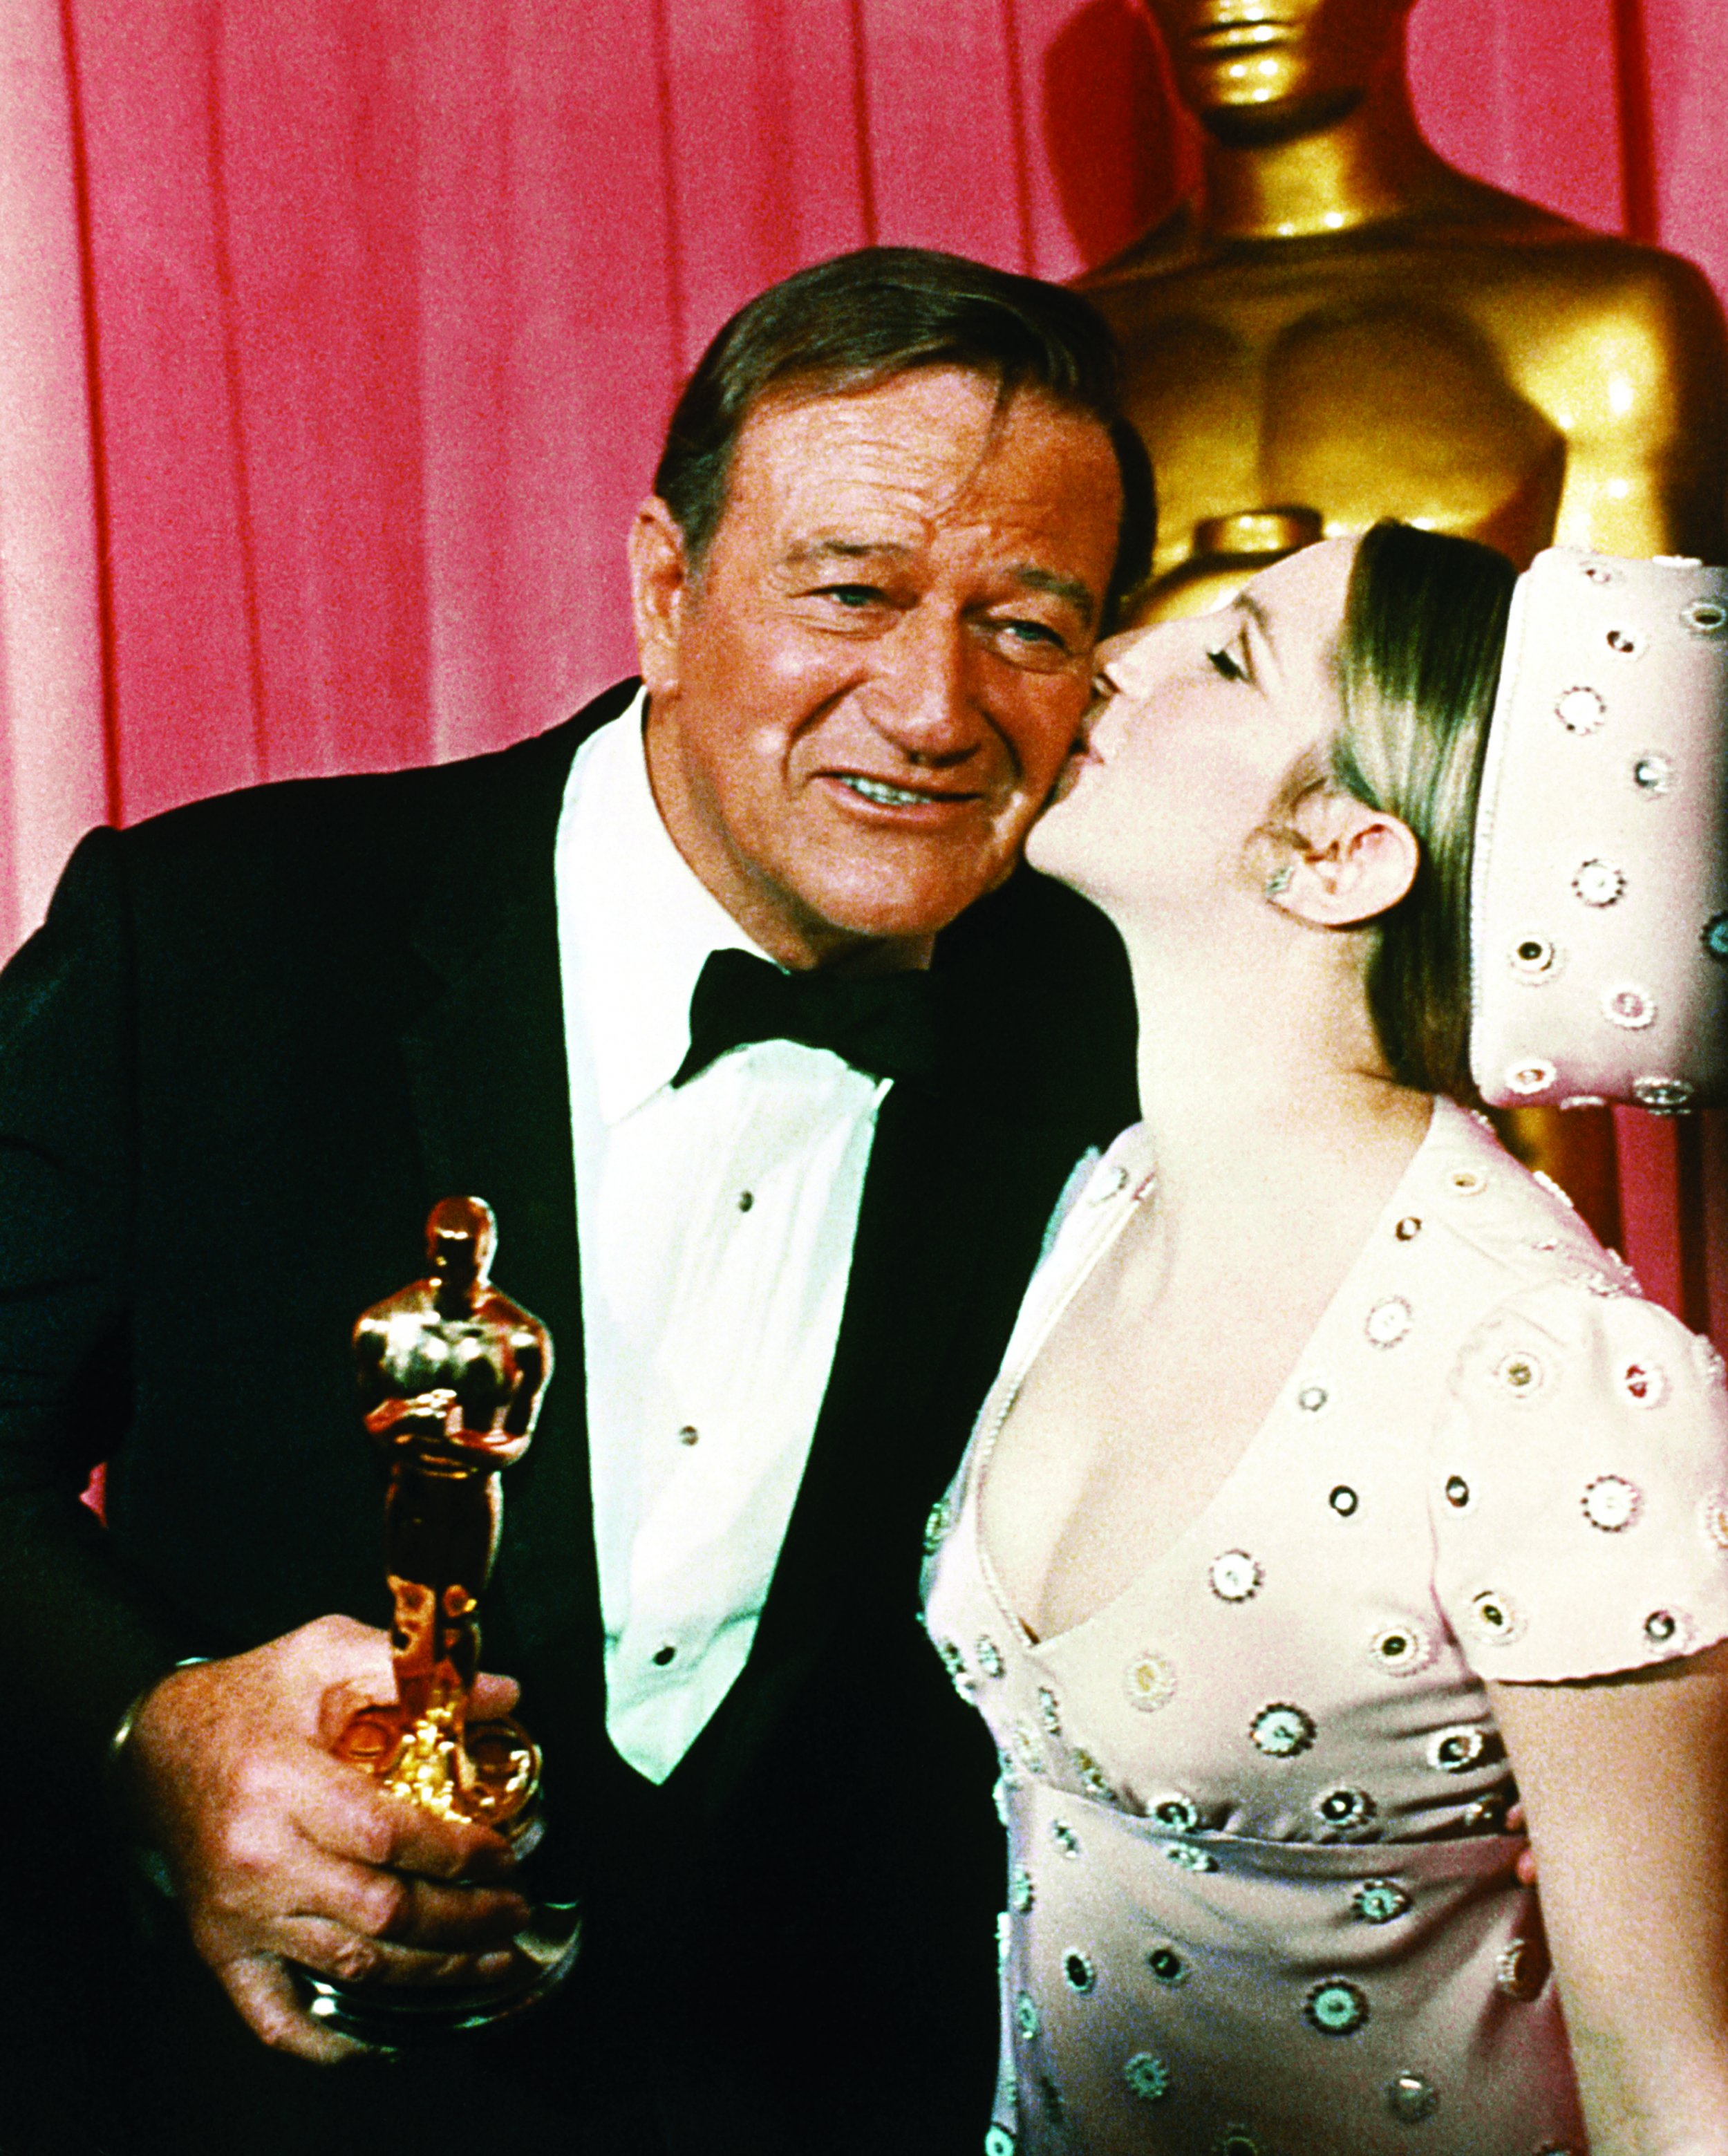 Colorado Film School: Did John Wayne's Oscar Come Too Late?